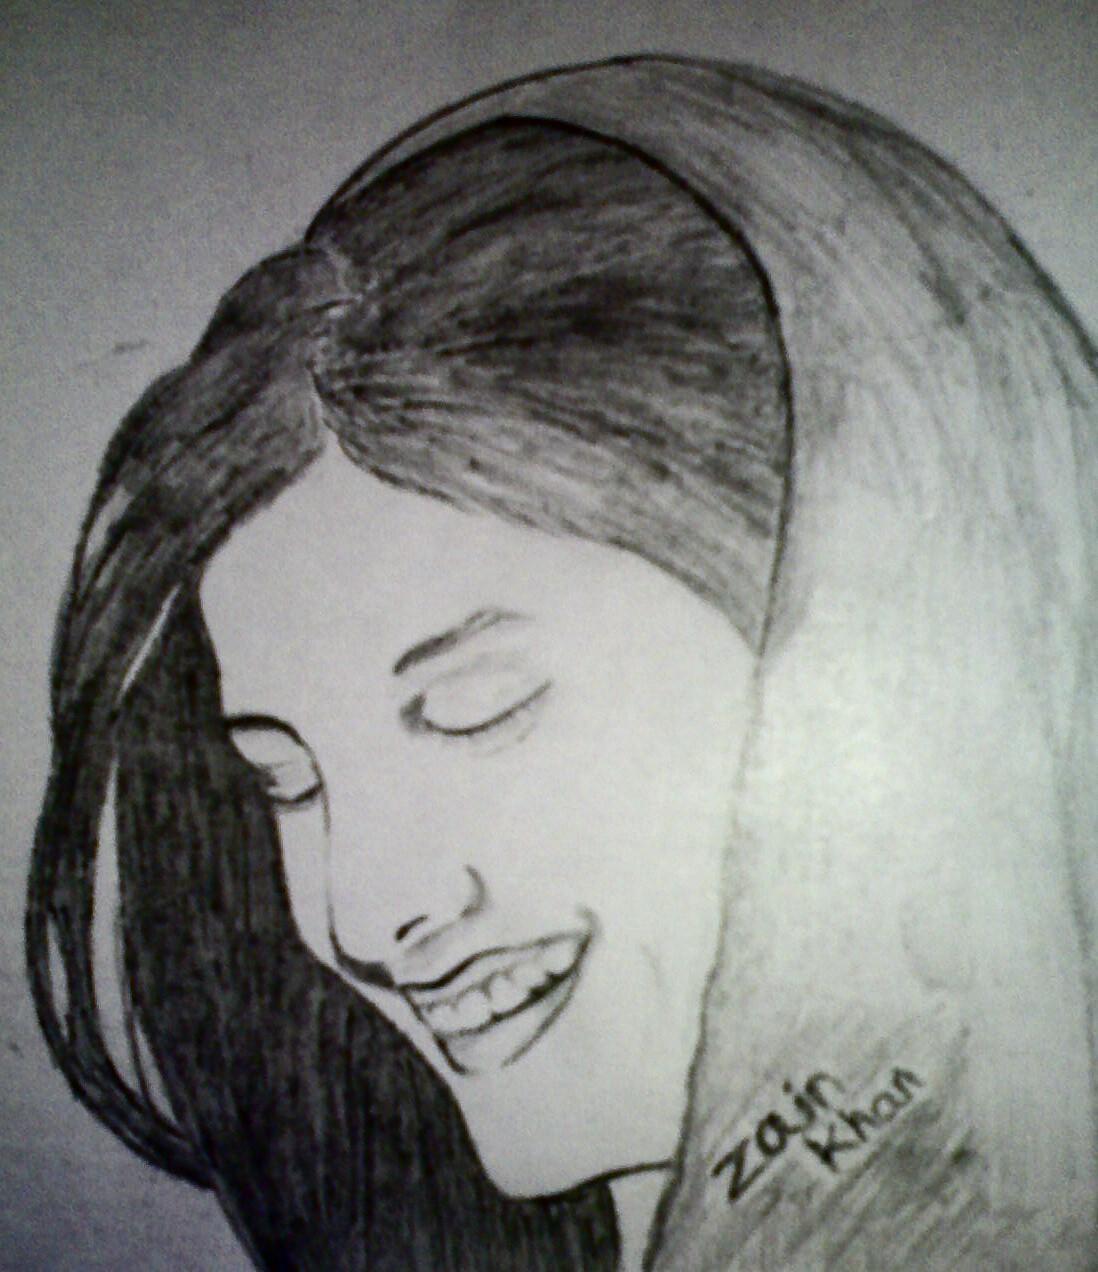 Smiling girl sketch